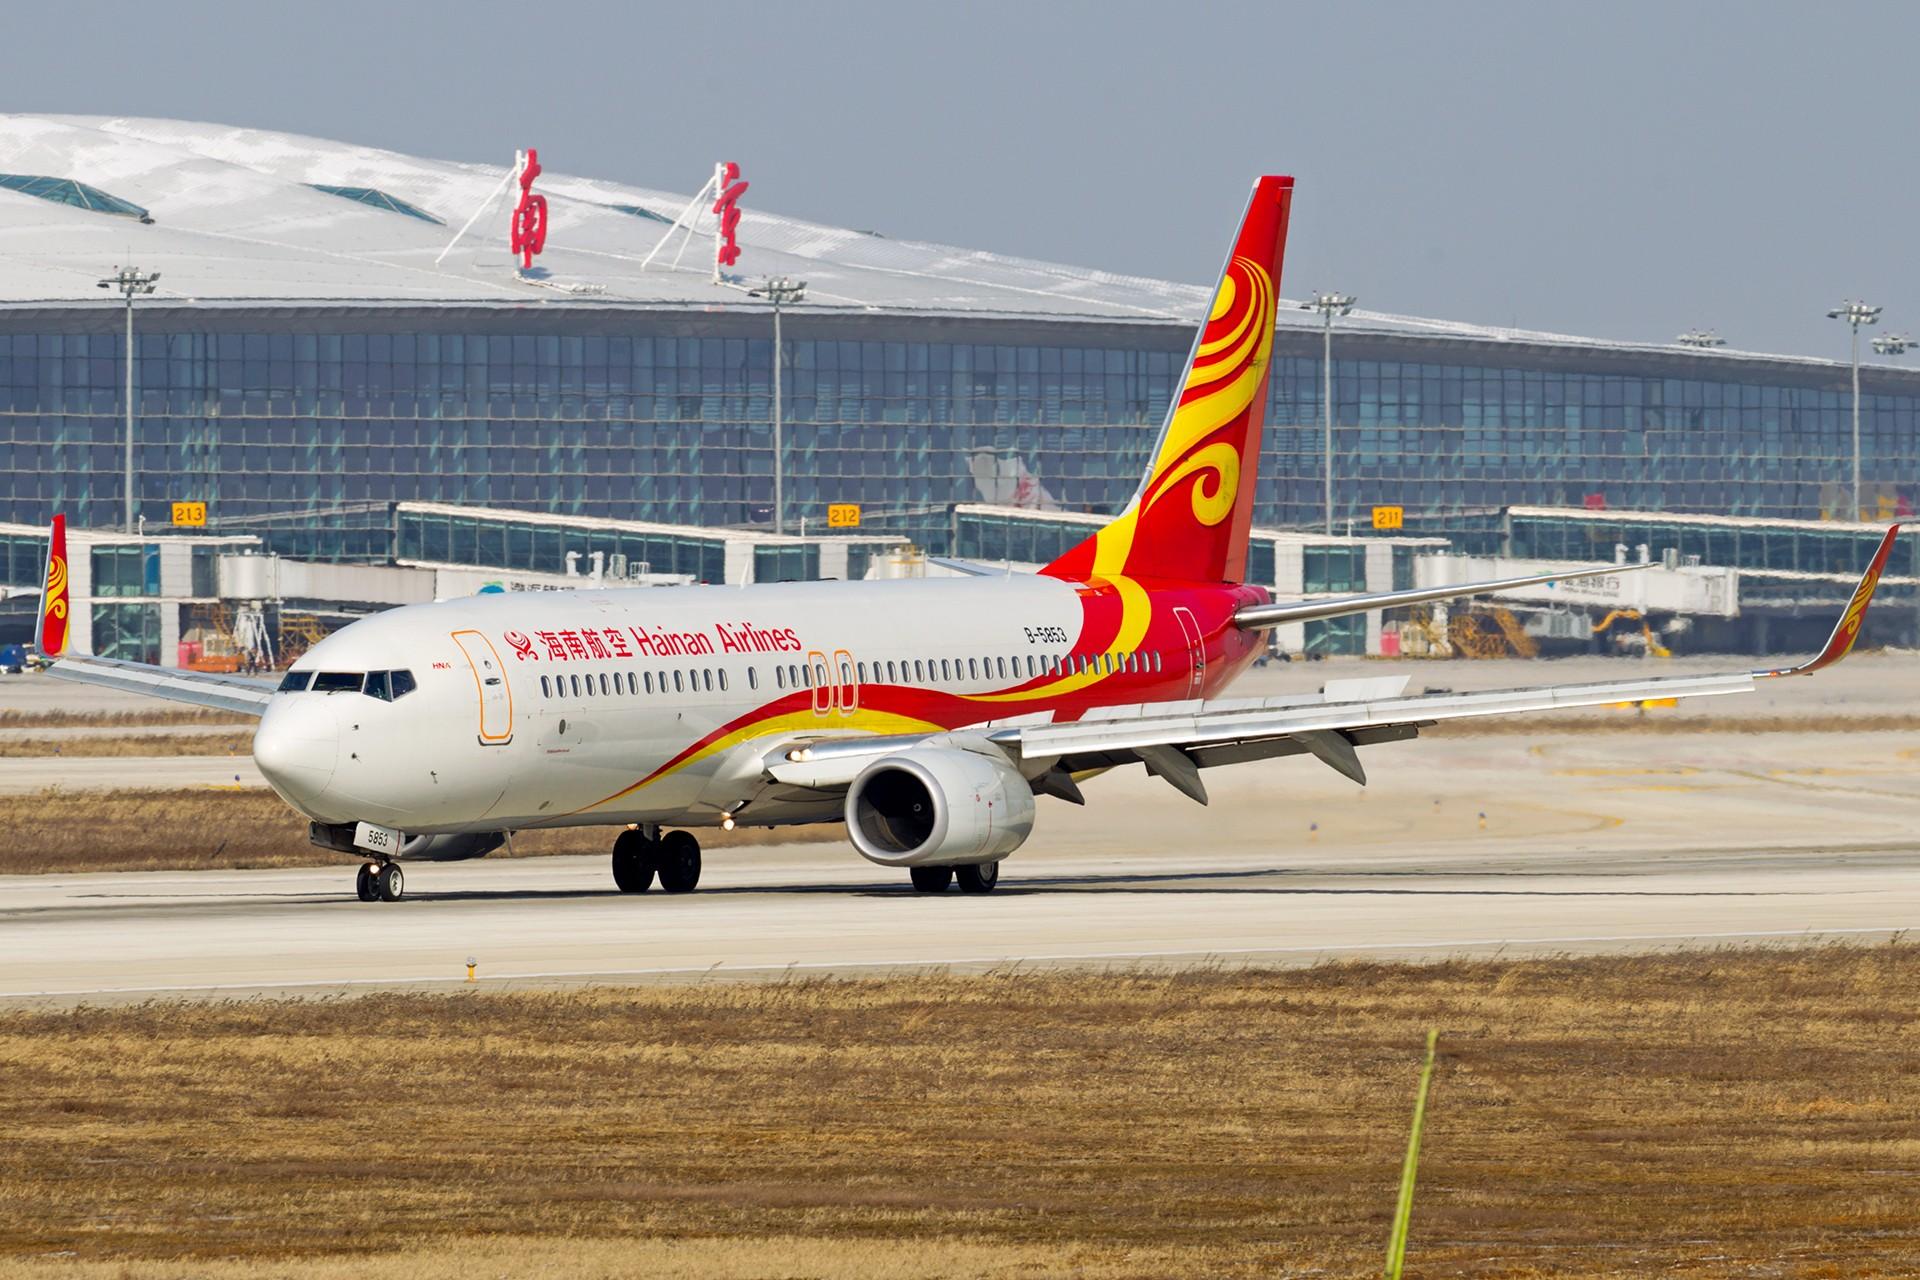 Re:[BLDDQ]******最高温度-5度,我也是醉了****** BOEING 737-800 B-5853 中国南京禄口国际机场